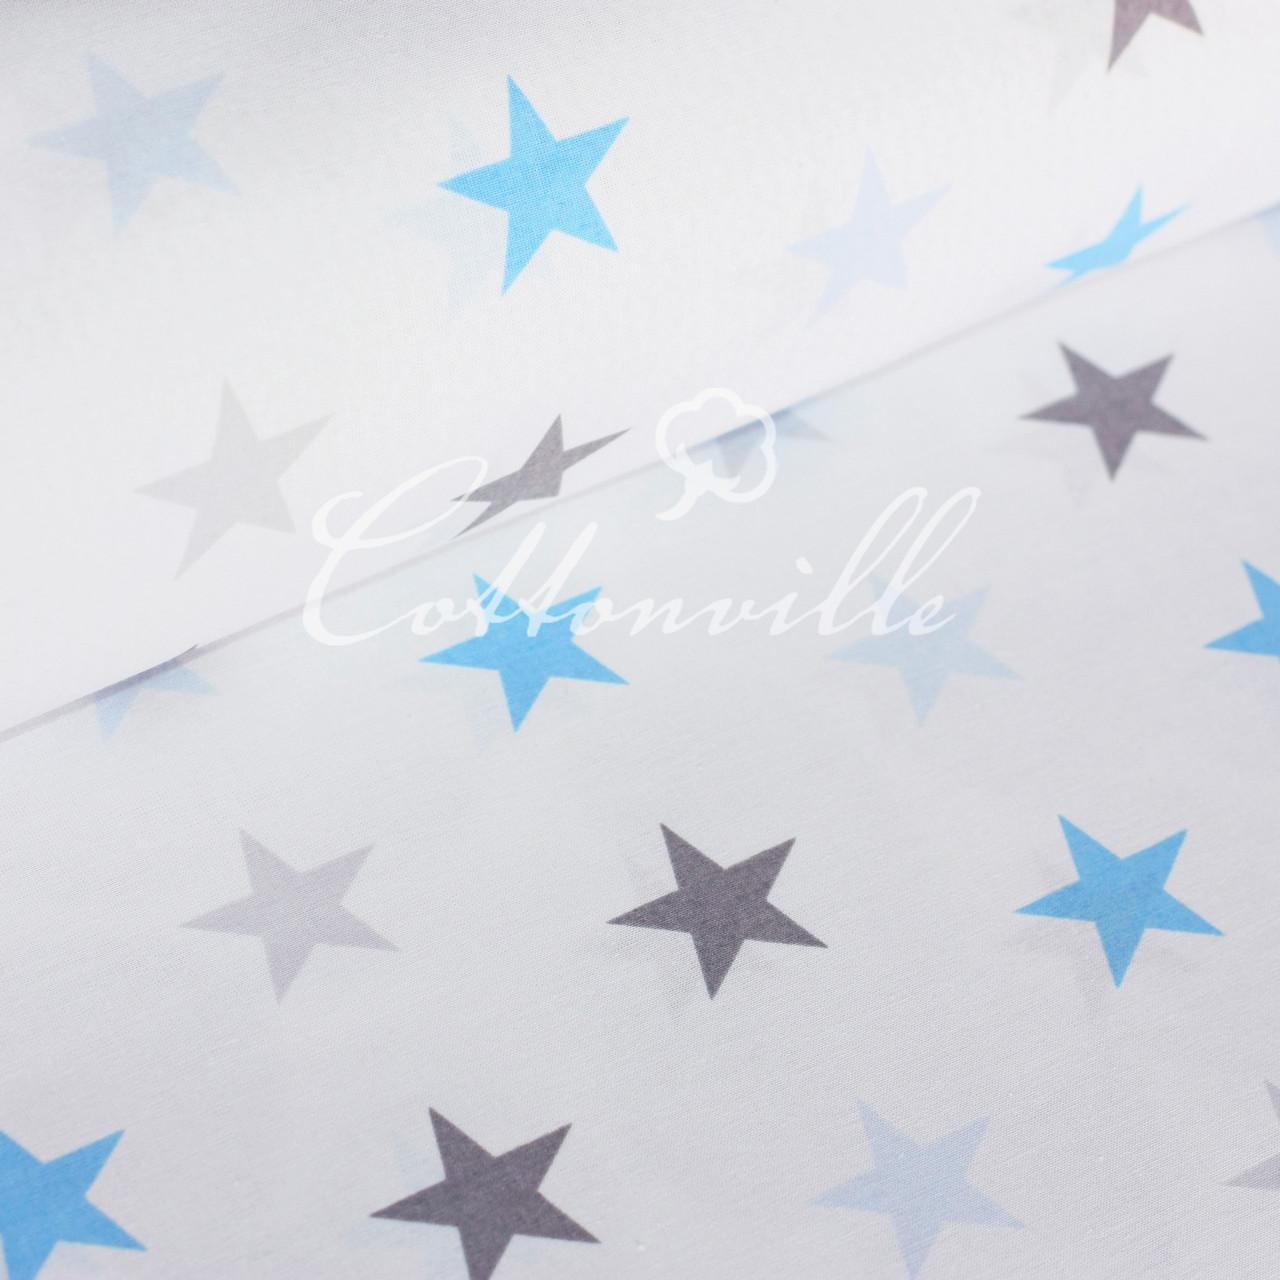 Бязь Серые голубые звезды (40 мм)